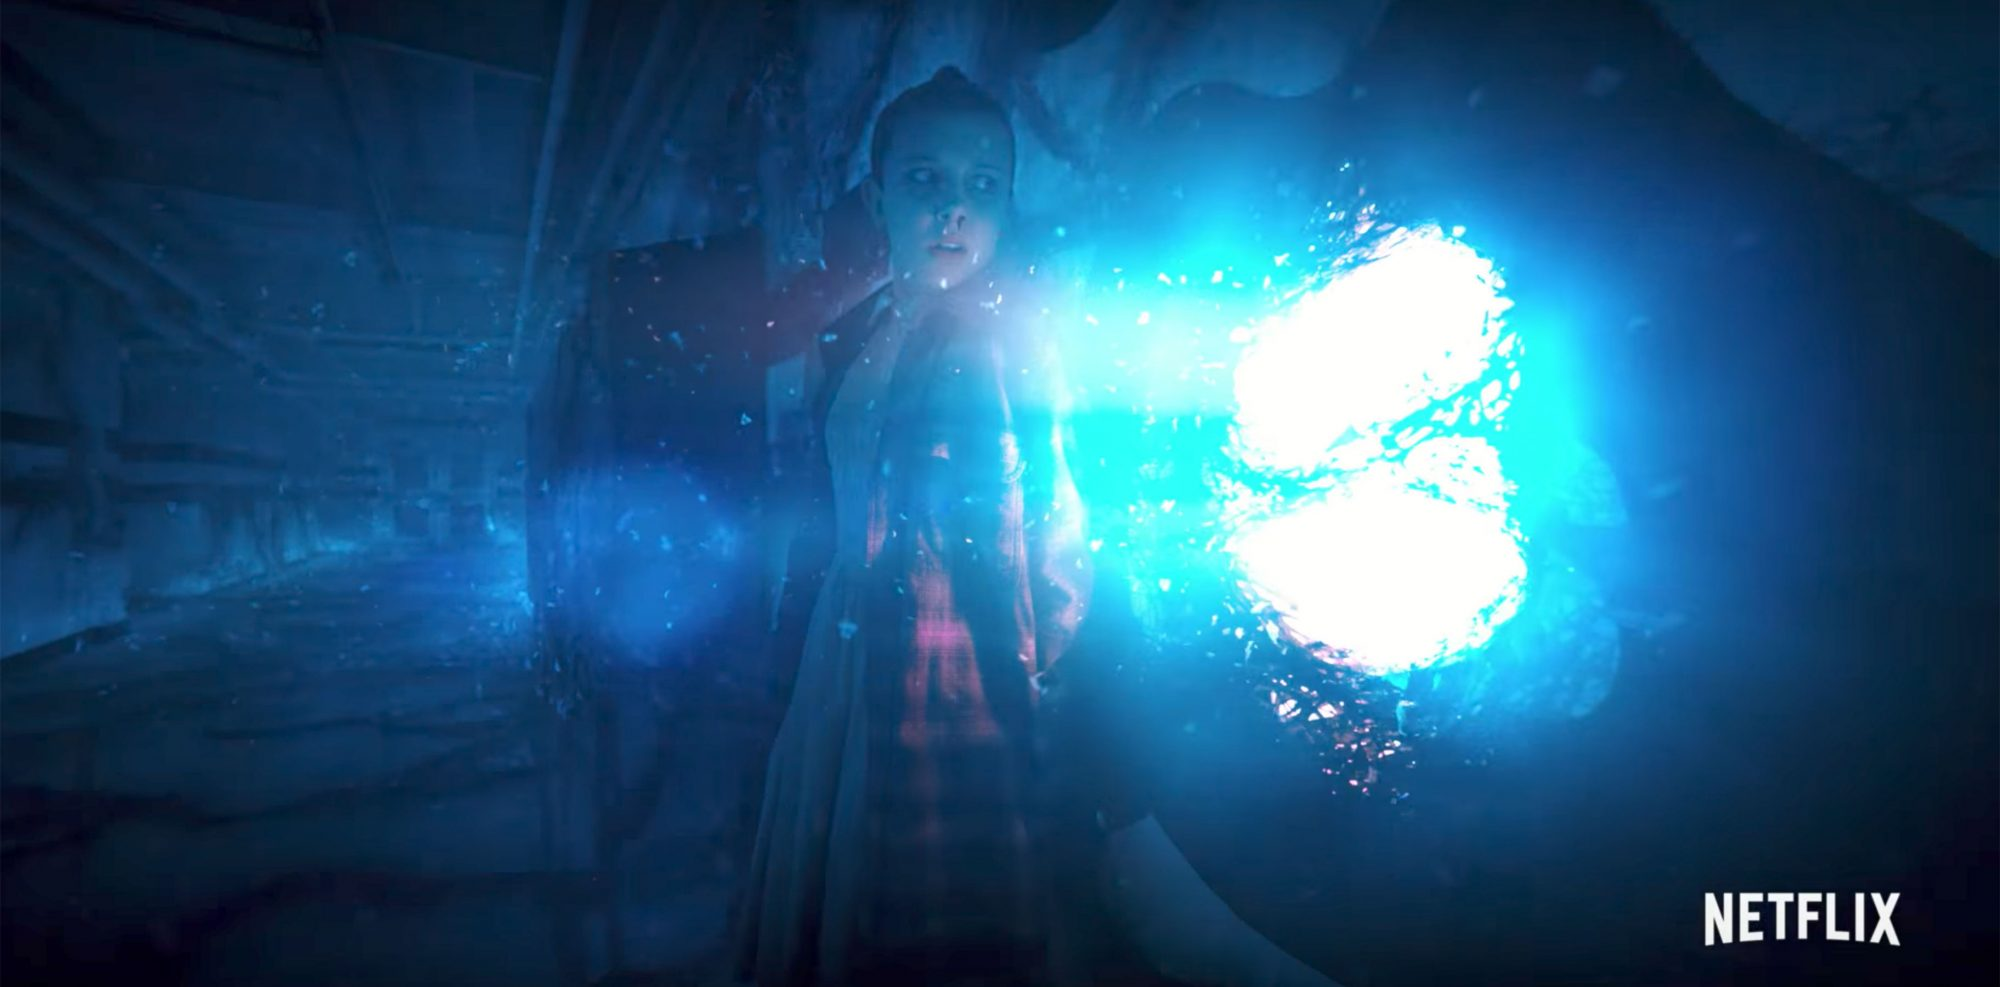 Stranger Things Trailer screen grab